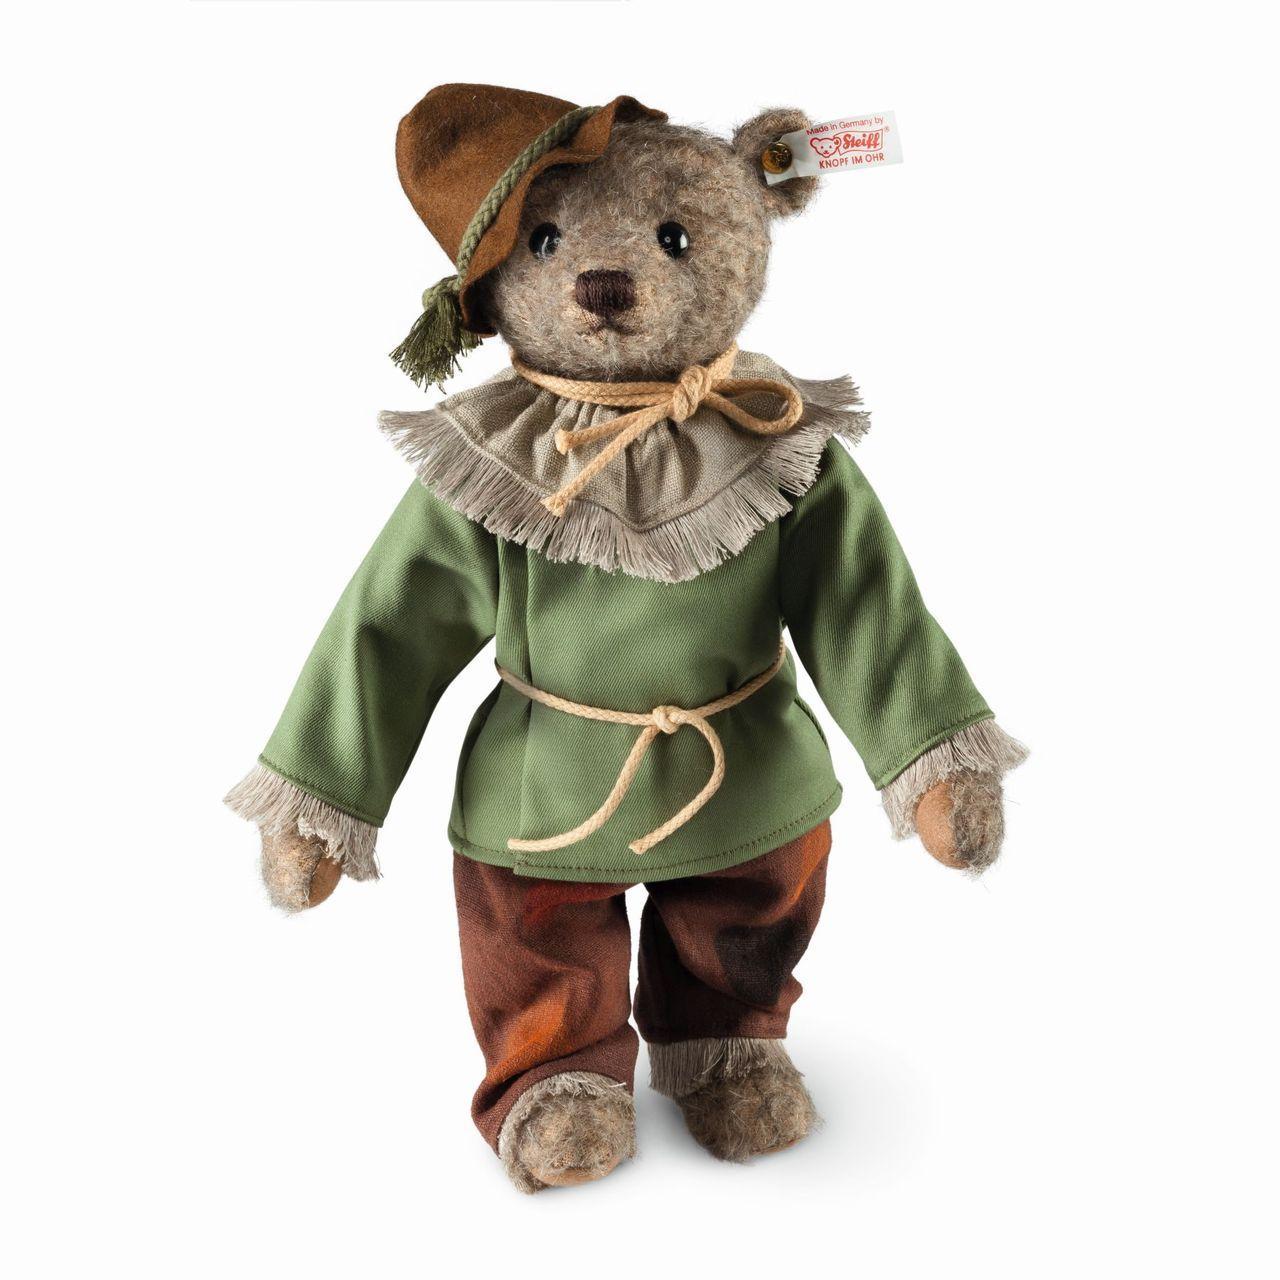 Wizard of oz christmas decorations uk - Steiff Wizard Of Oz Scarecrow Teddy Bear Ean 682681